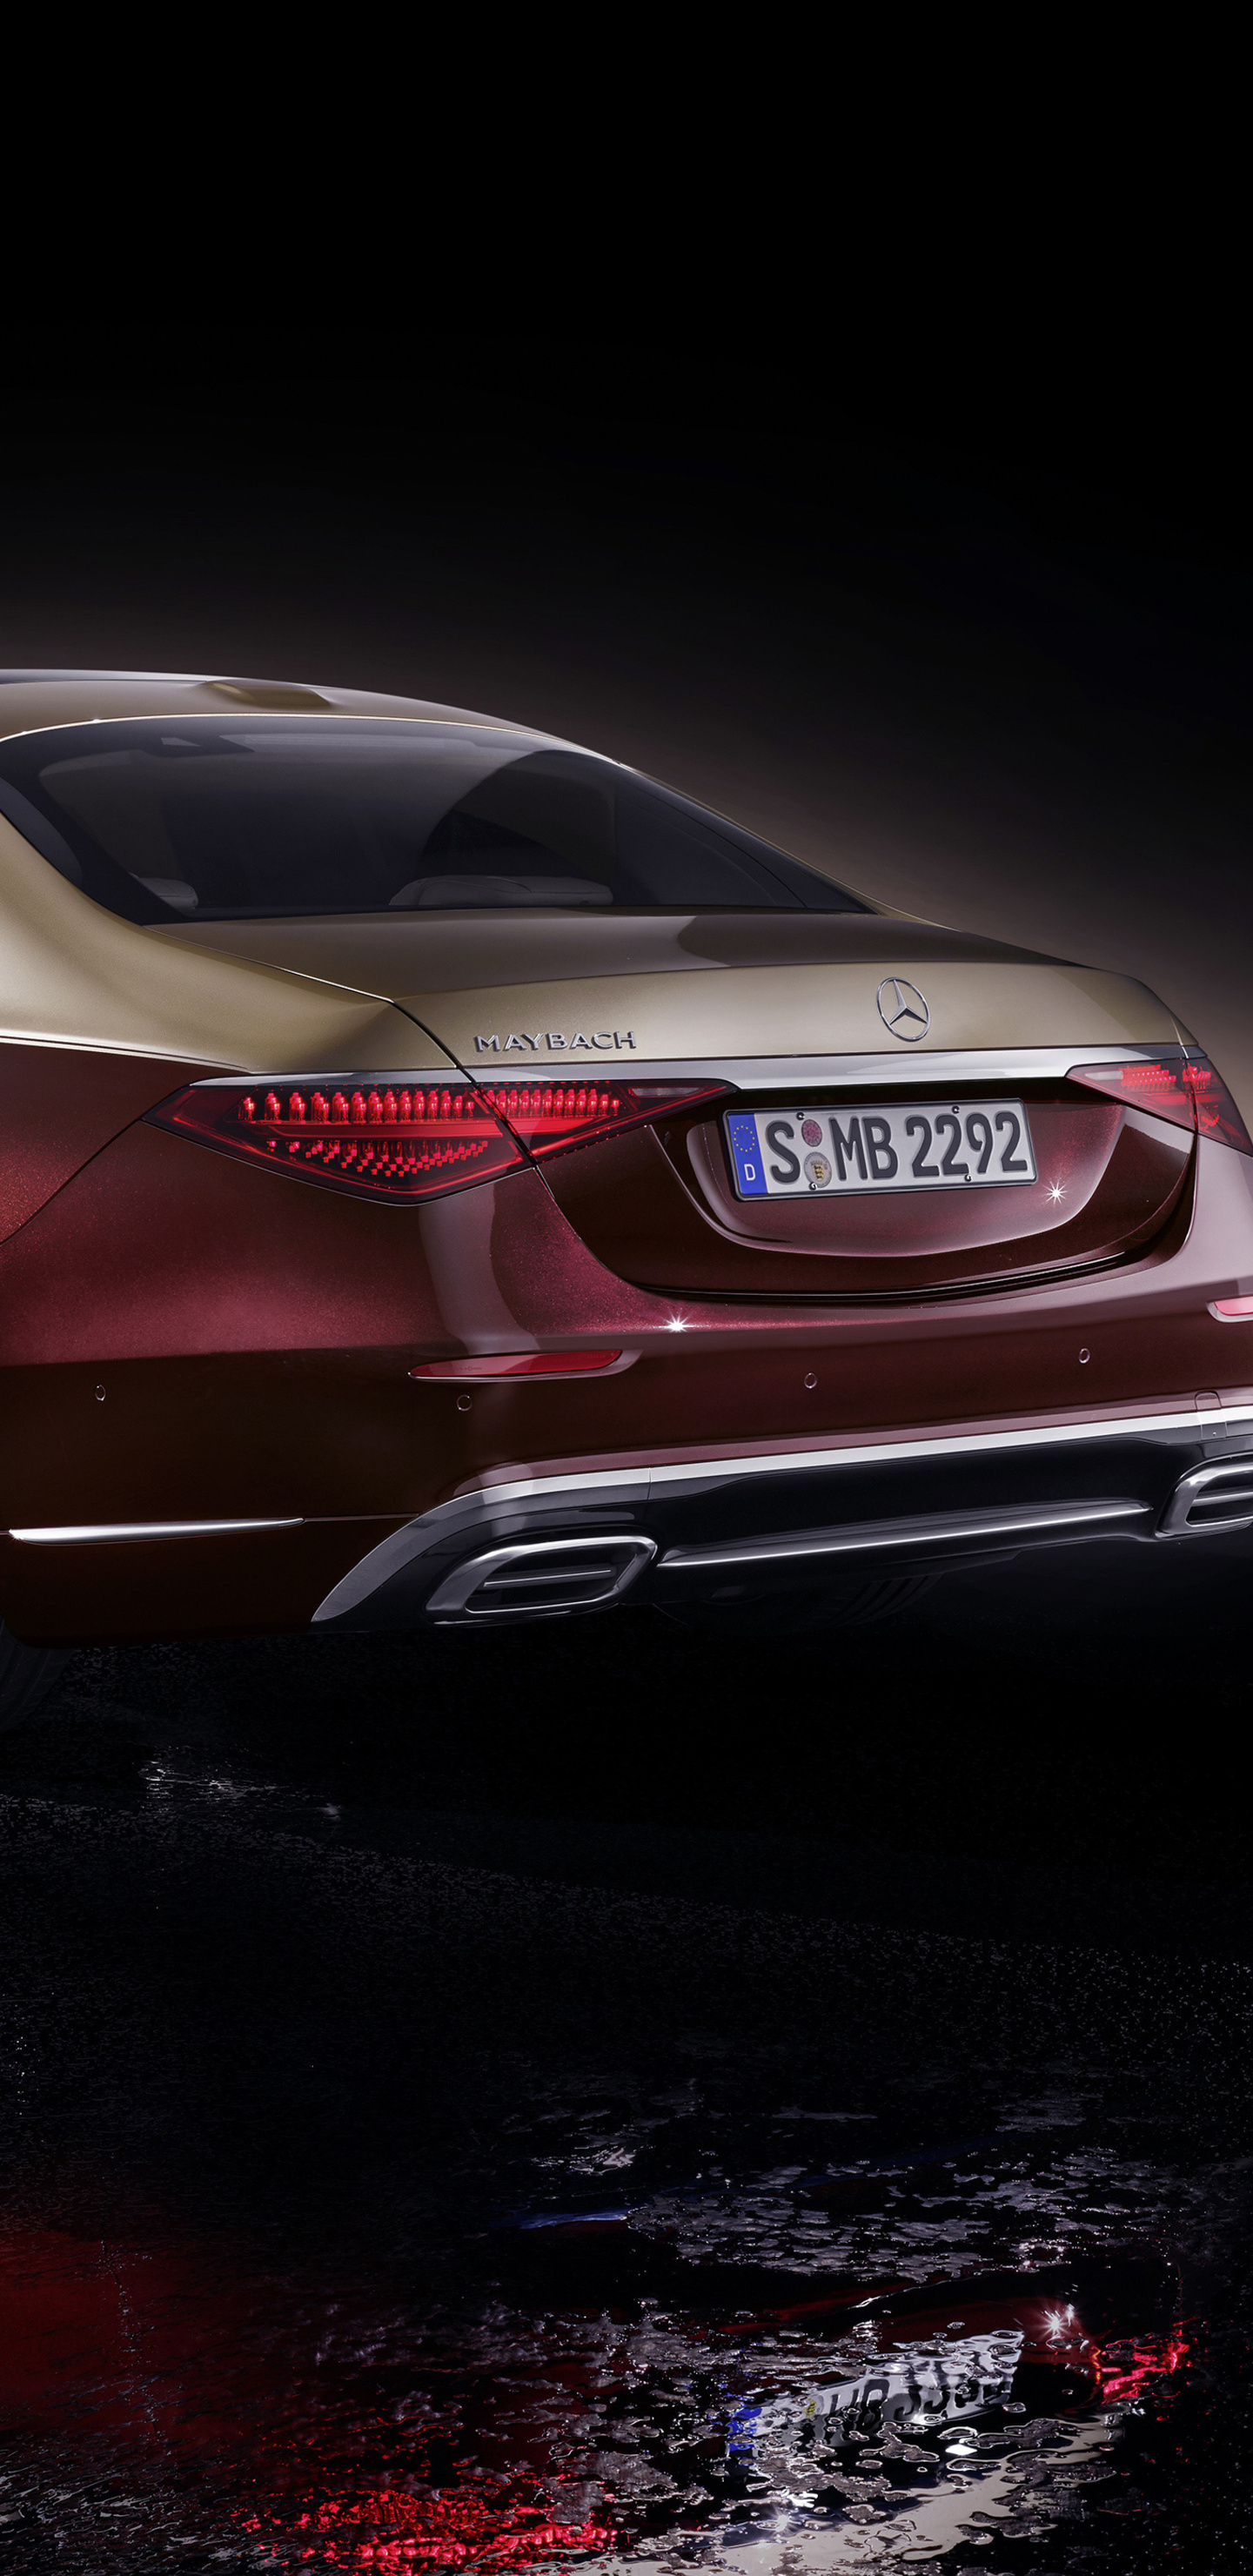 2020-mercedes-s-class-maybach-5k-u0.jpg